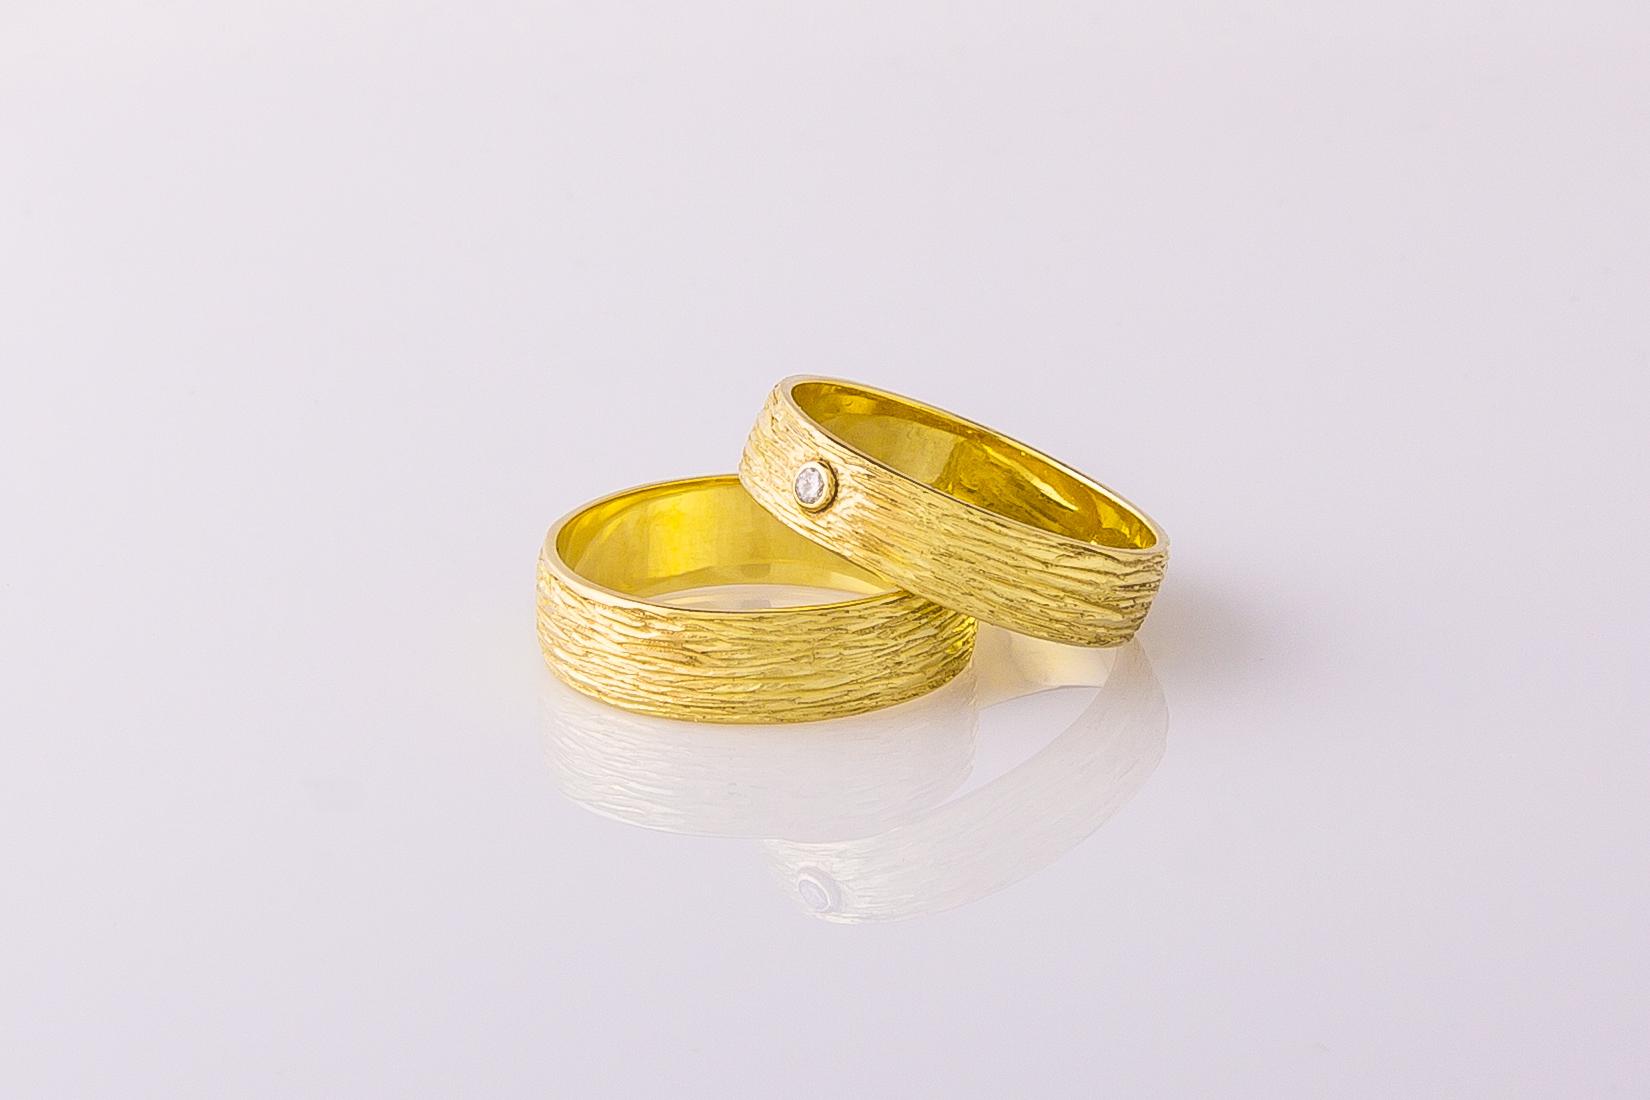 goudmerk-ring-trouwen-geel-goud-grof-bewerkt-edelsteen-briljant